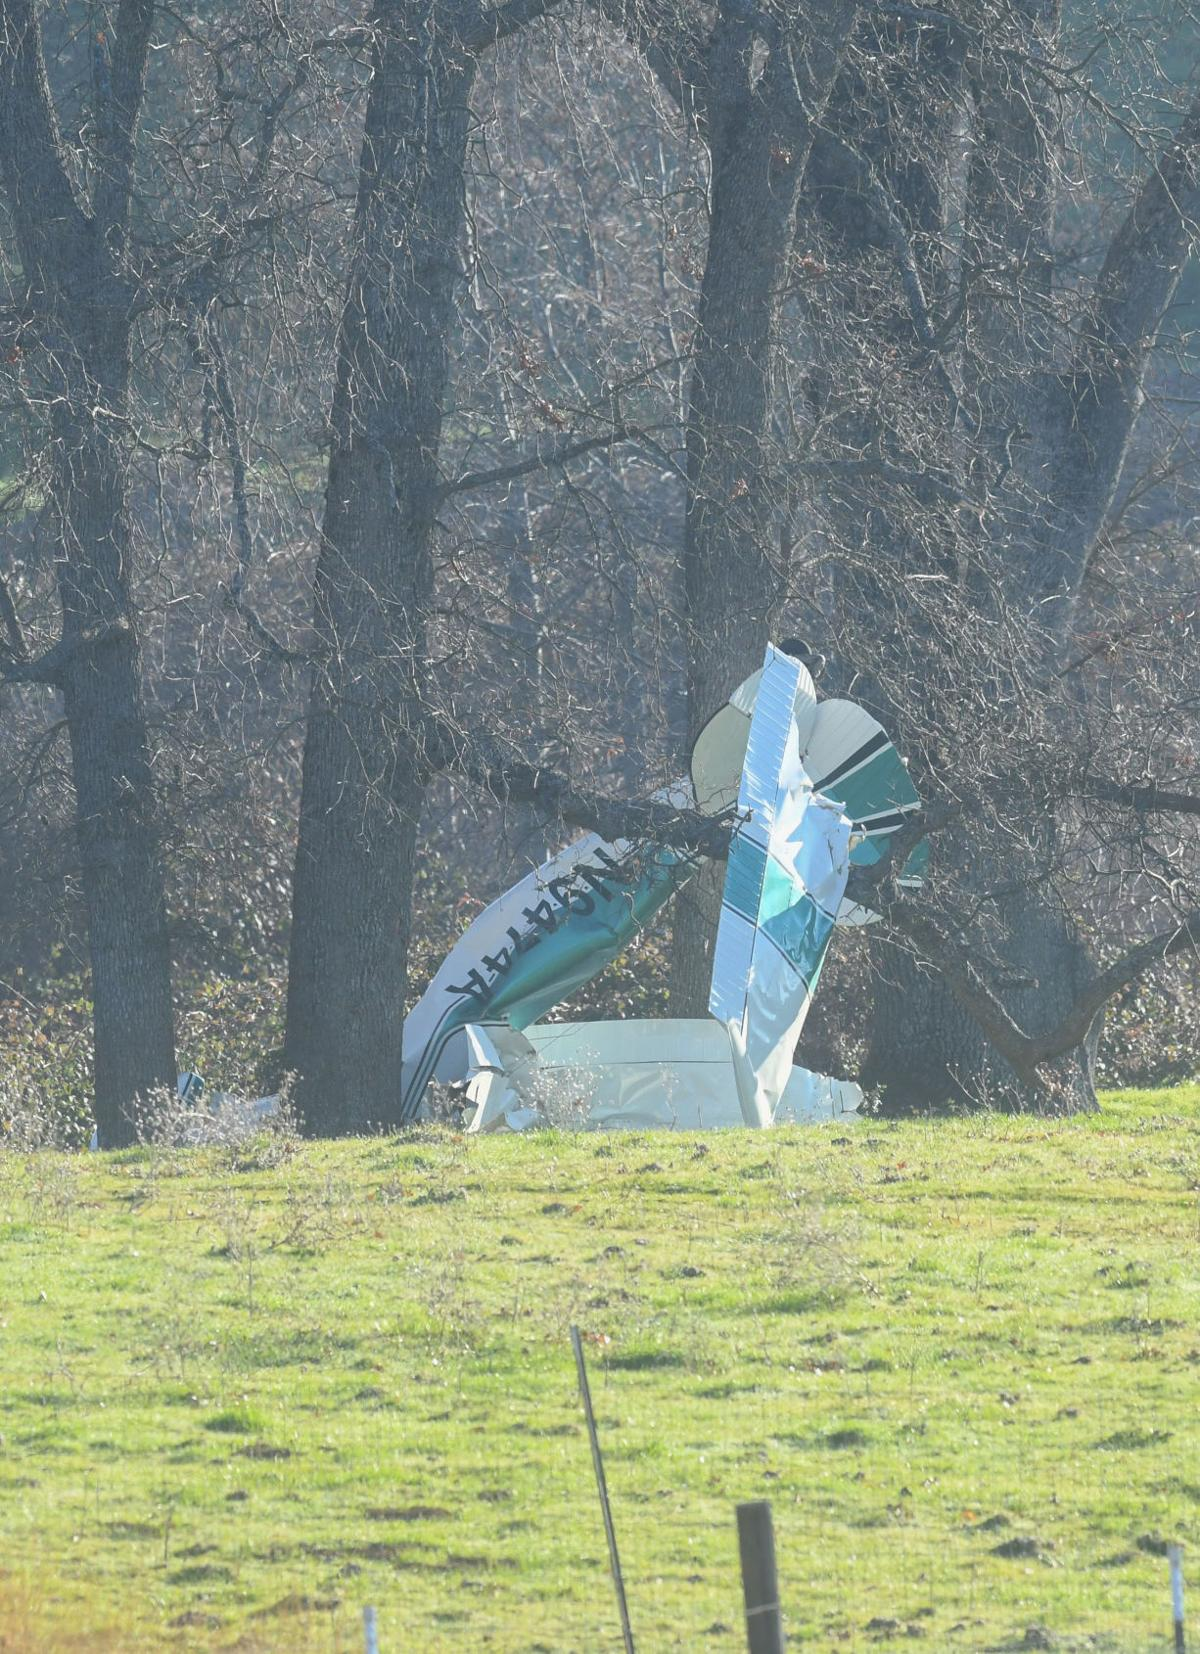 Plane crashes in Columbia, kills two